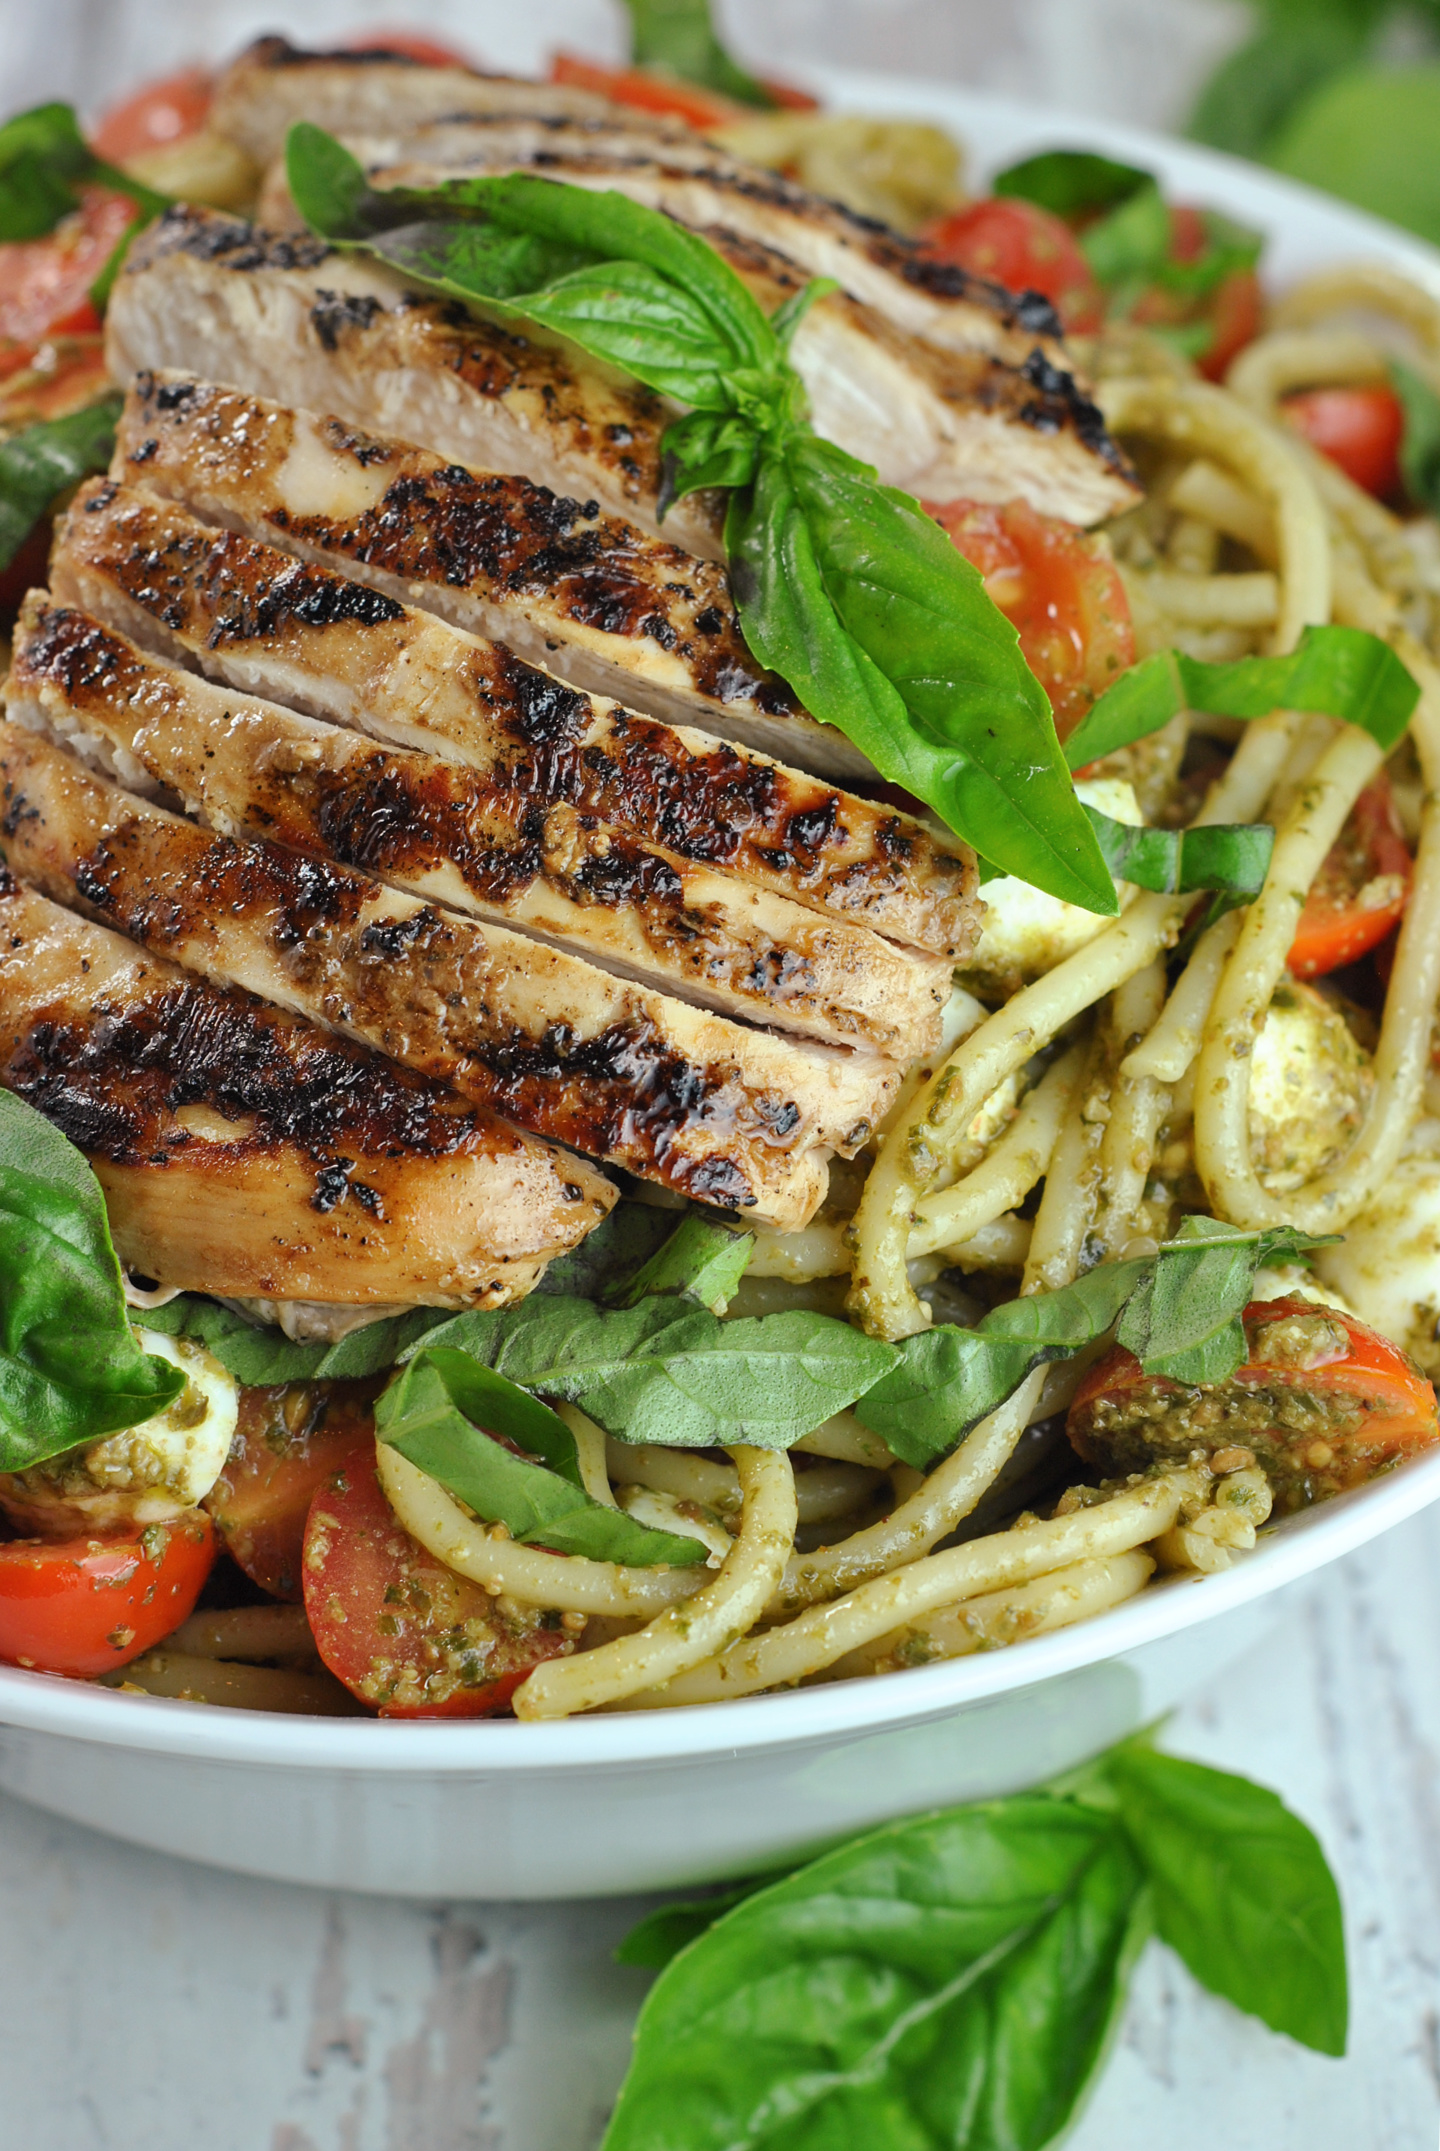 Balsamic Chicken with Pesto Caprese Pasta via @preventionrd